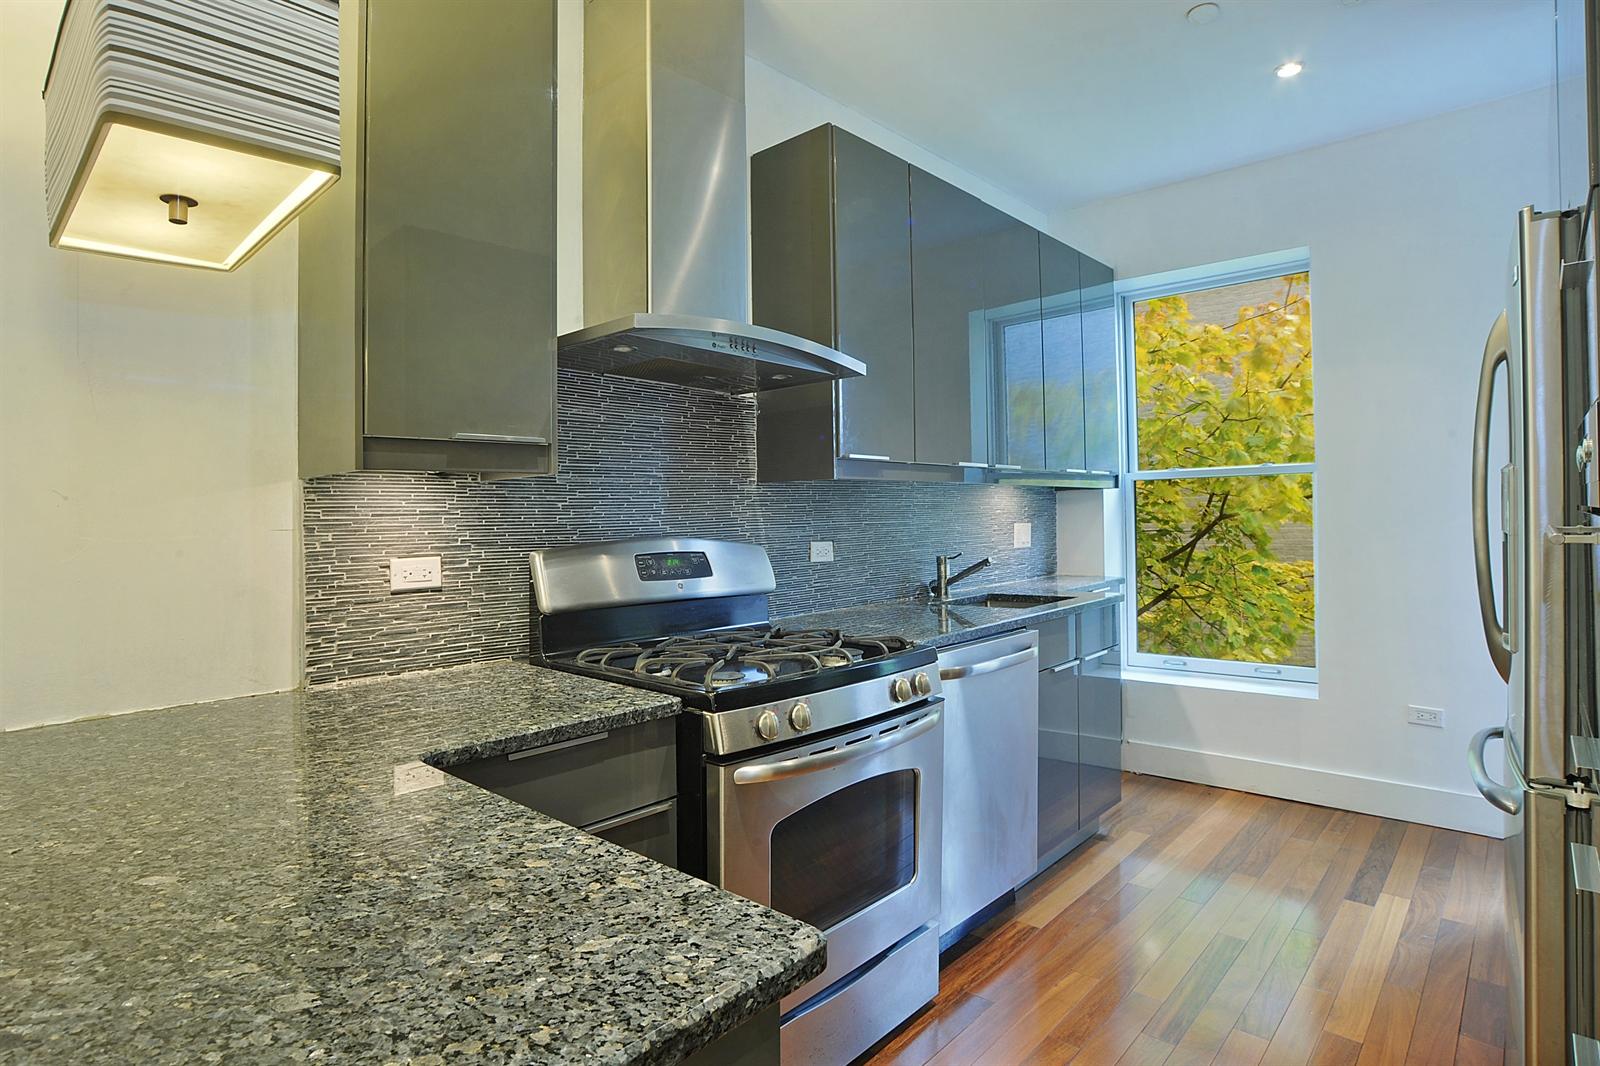 Corcoran, 245 LENOX AVE, Apt. 2, Harlem Rentals, Manhattan Rentals ...